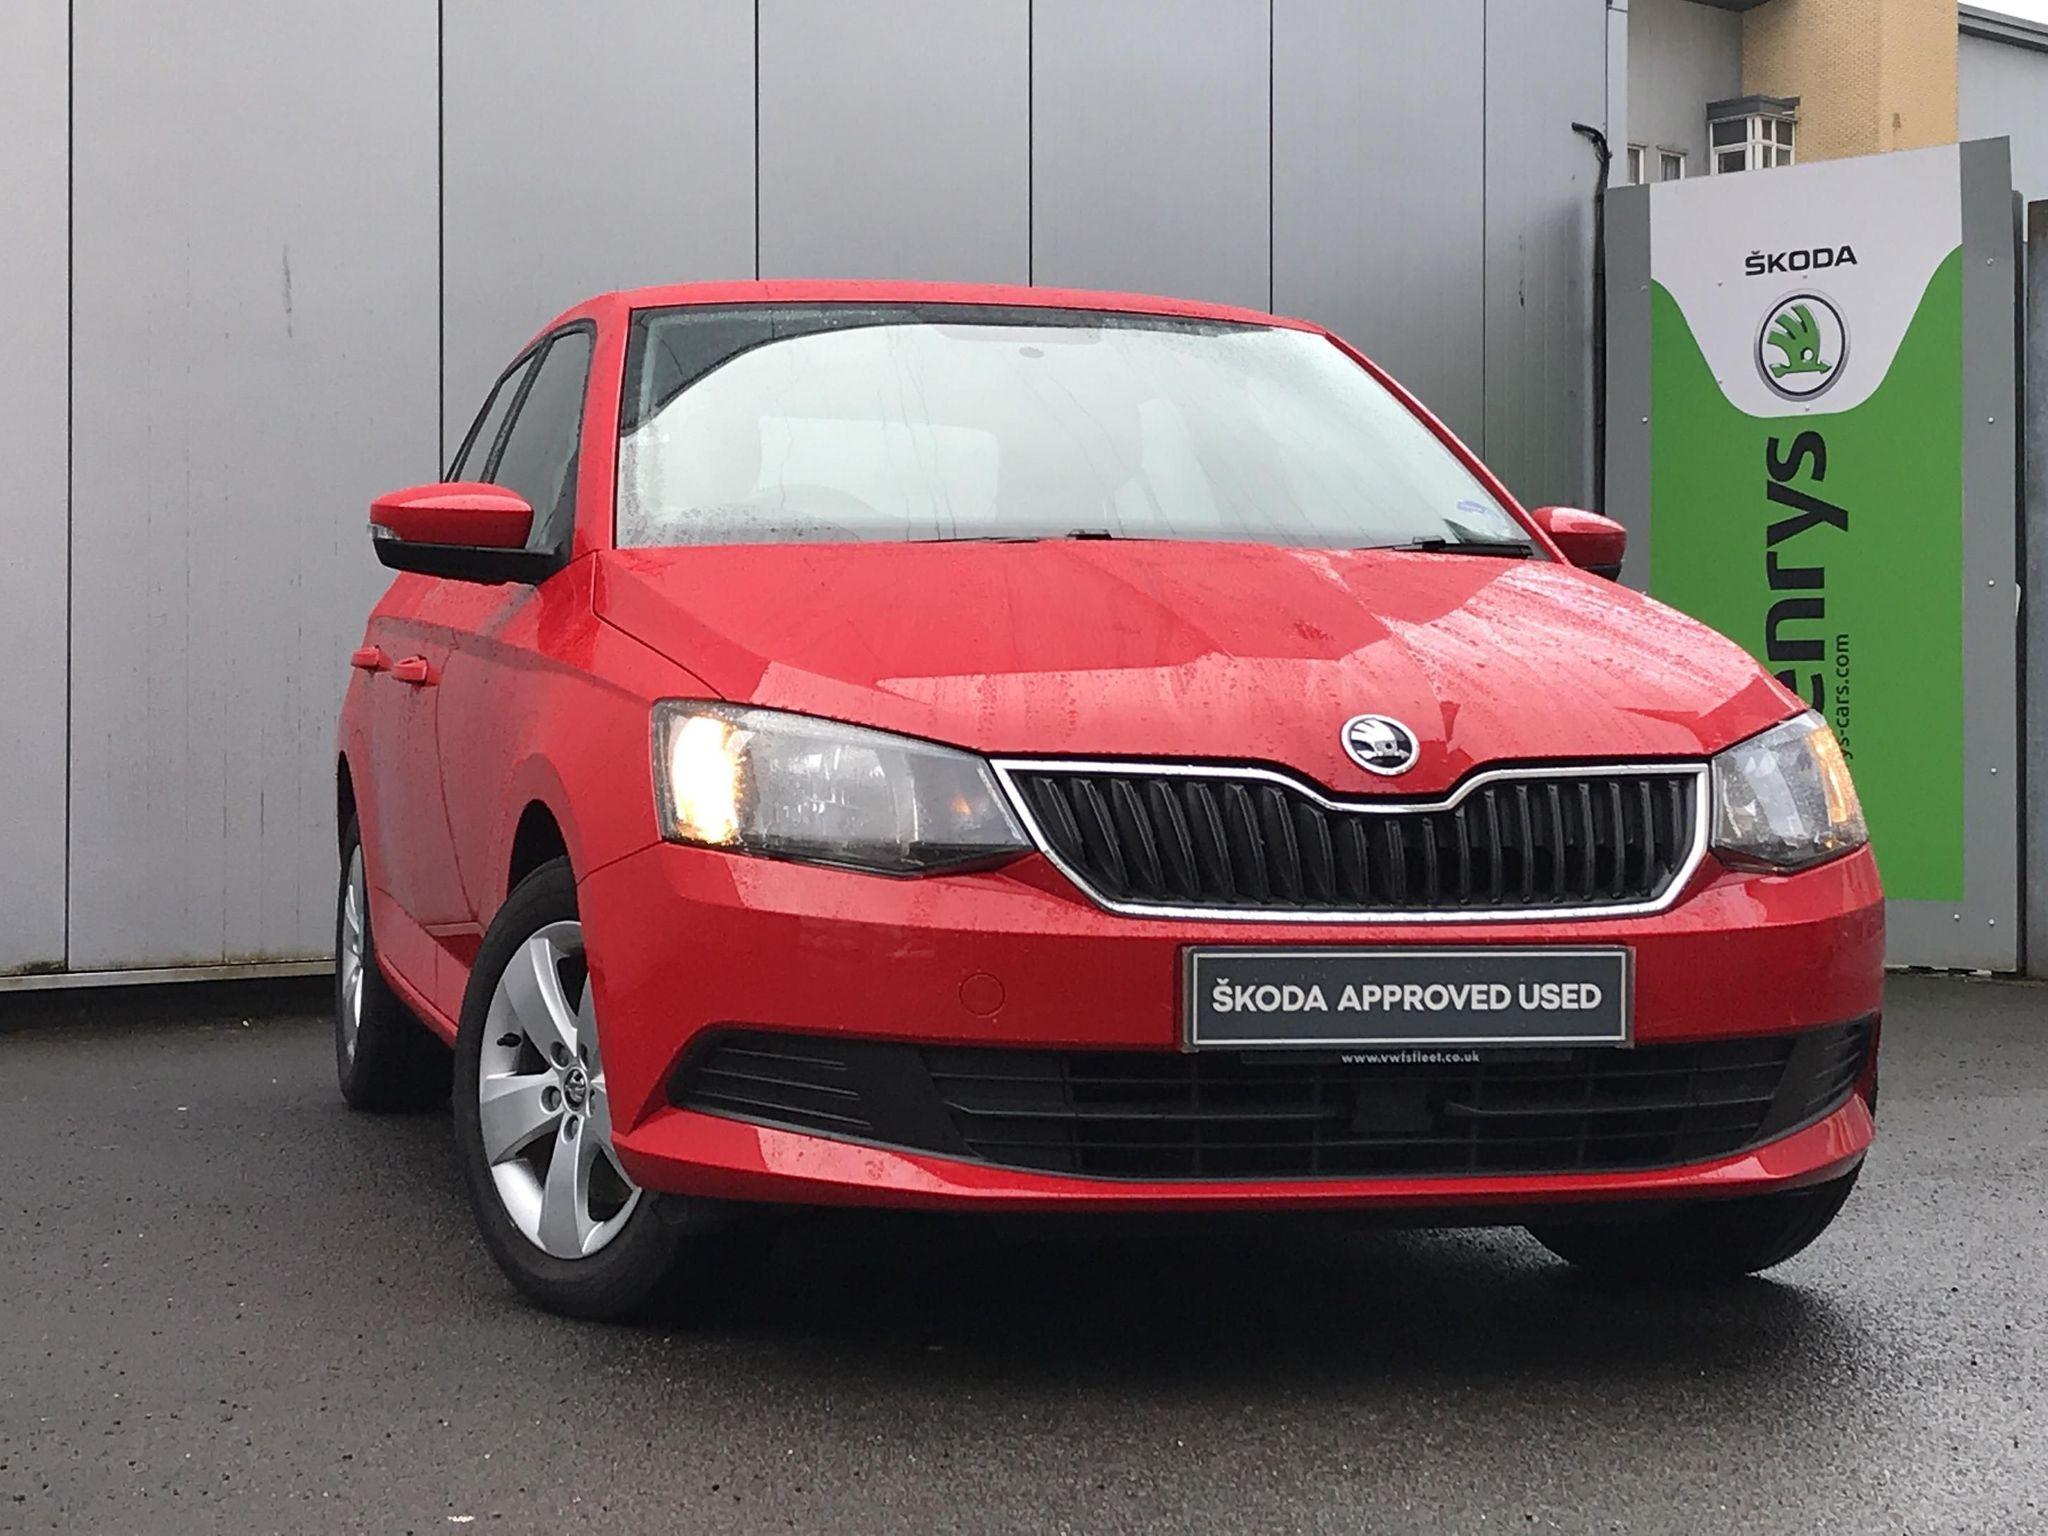 ŠKODA Fabia 1.0 TSI SE (110PS) S/S DSG 5-Dr Hatchback